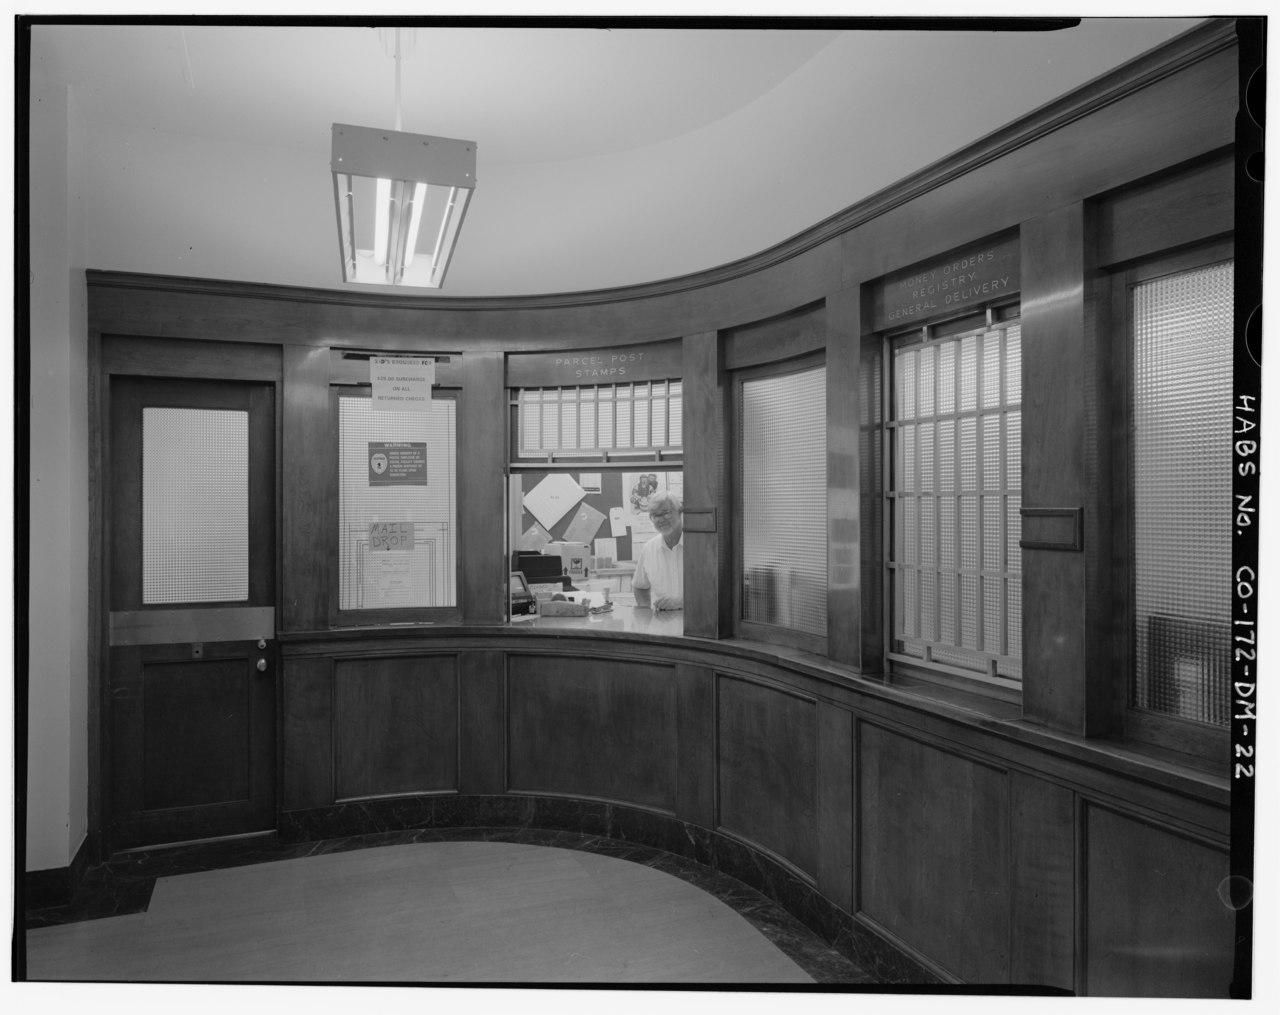 Ground Floor Window : File post office window lobby ground floor fitzsimons